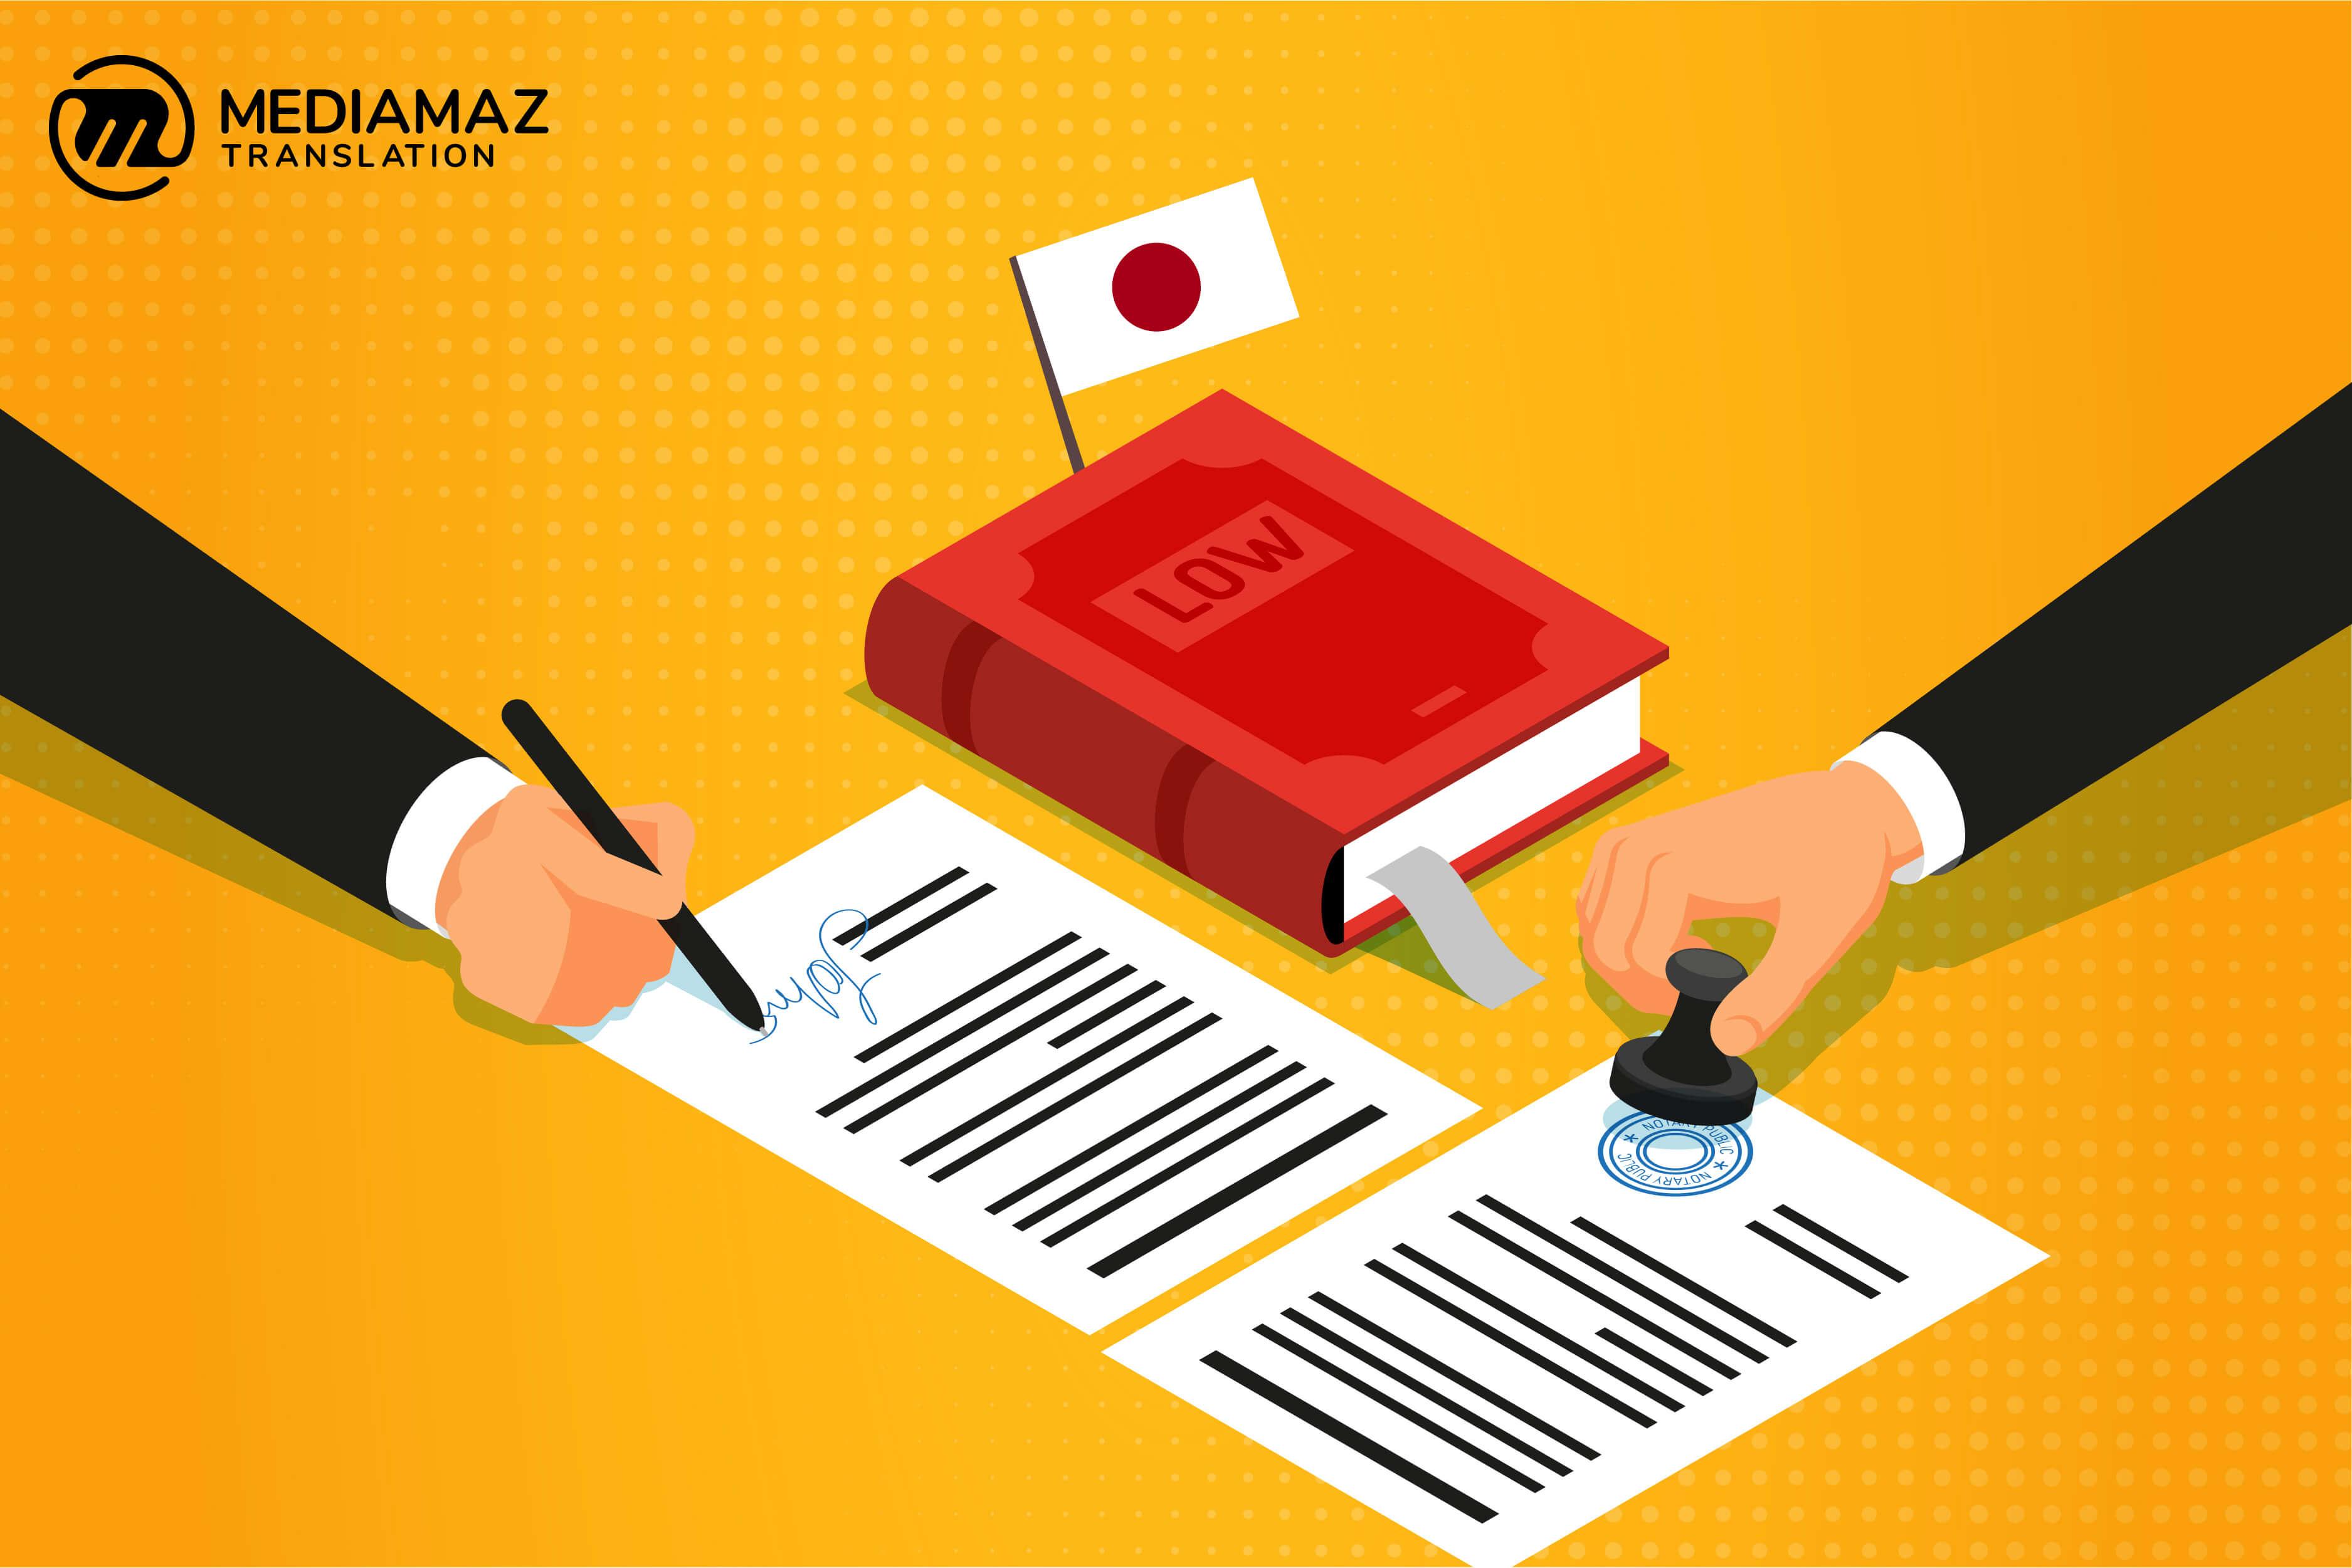 Kuliah di Jepang, Ini Syarat yang Harus Kamu Siapkan!